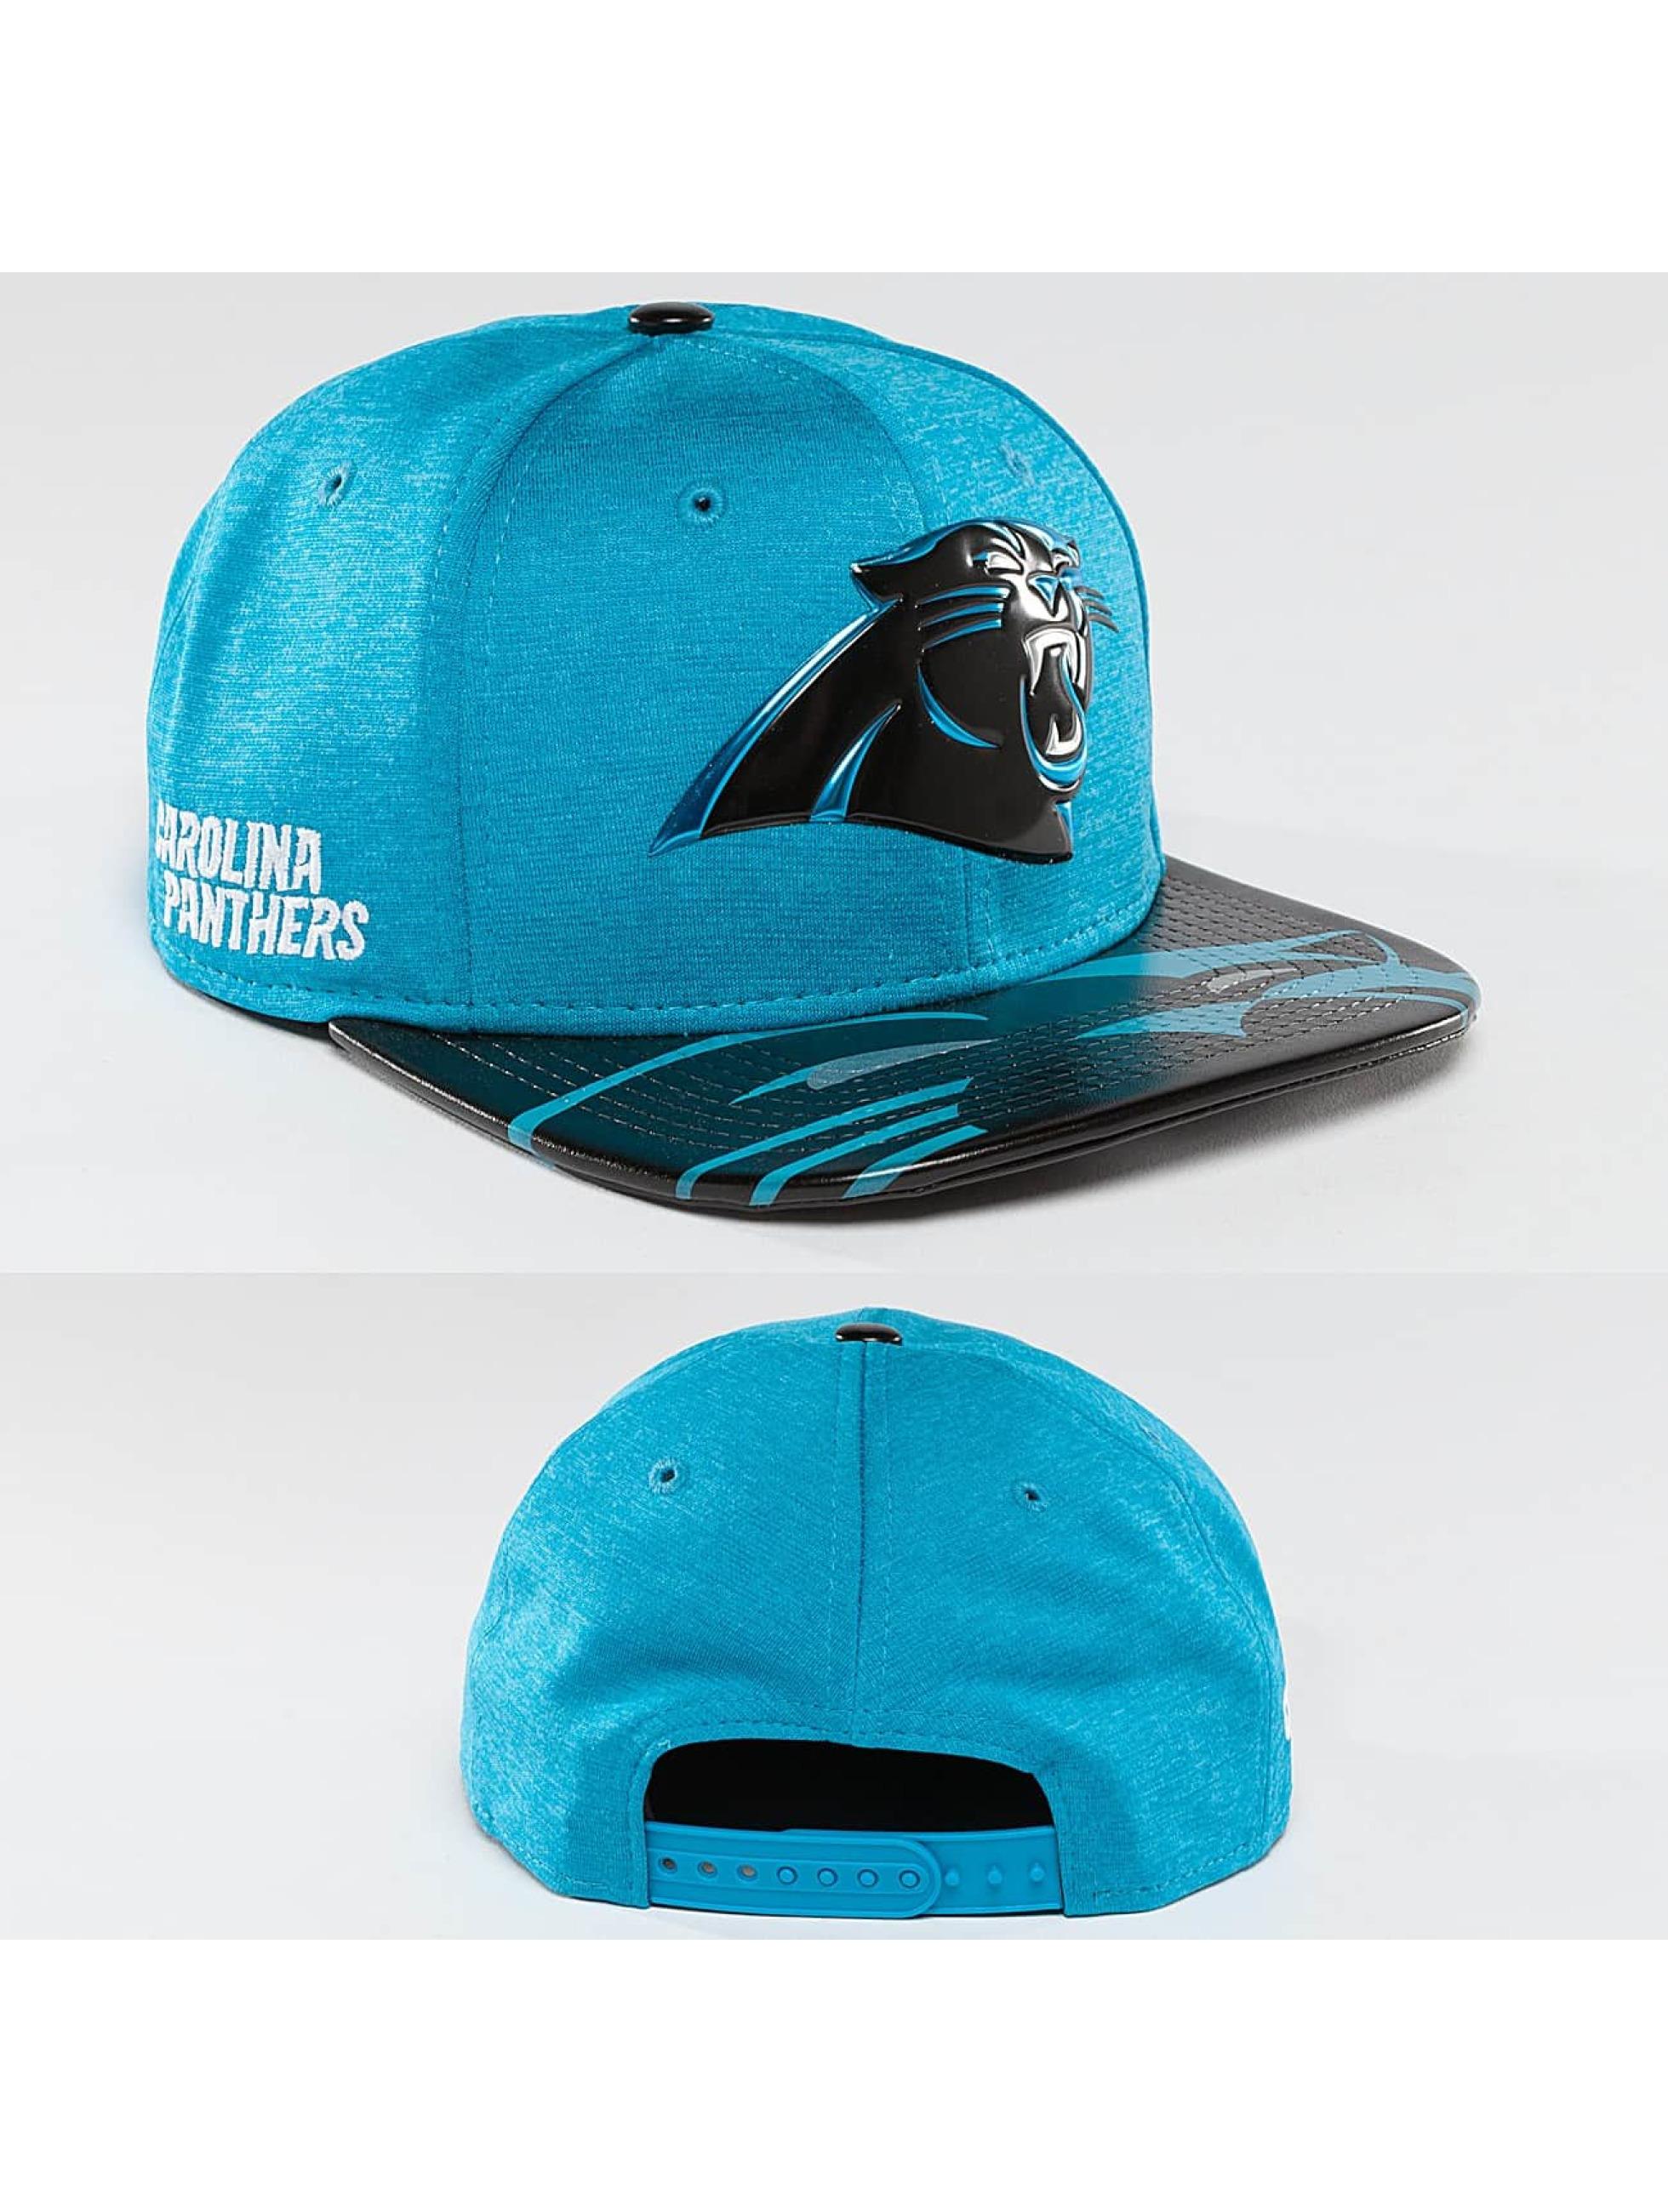 New Era Snapback Cap NFL Offical On Stage Carolina Panthers 9Fifty turquoise